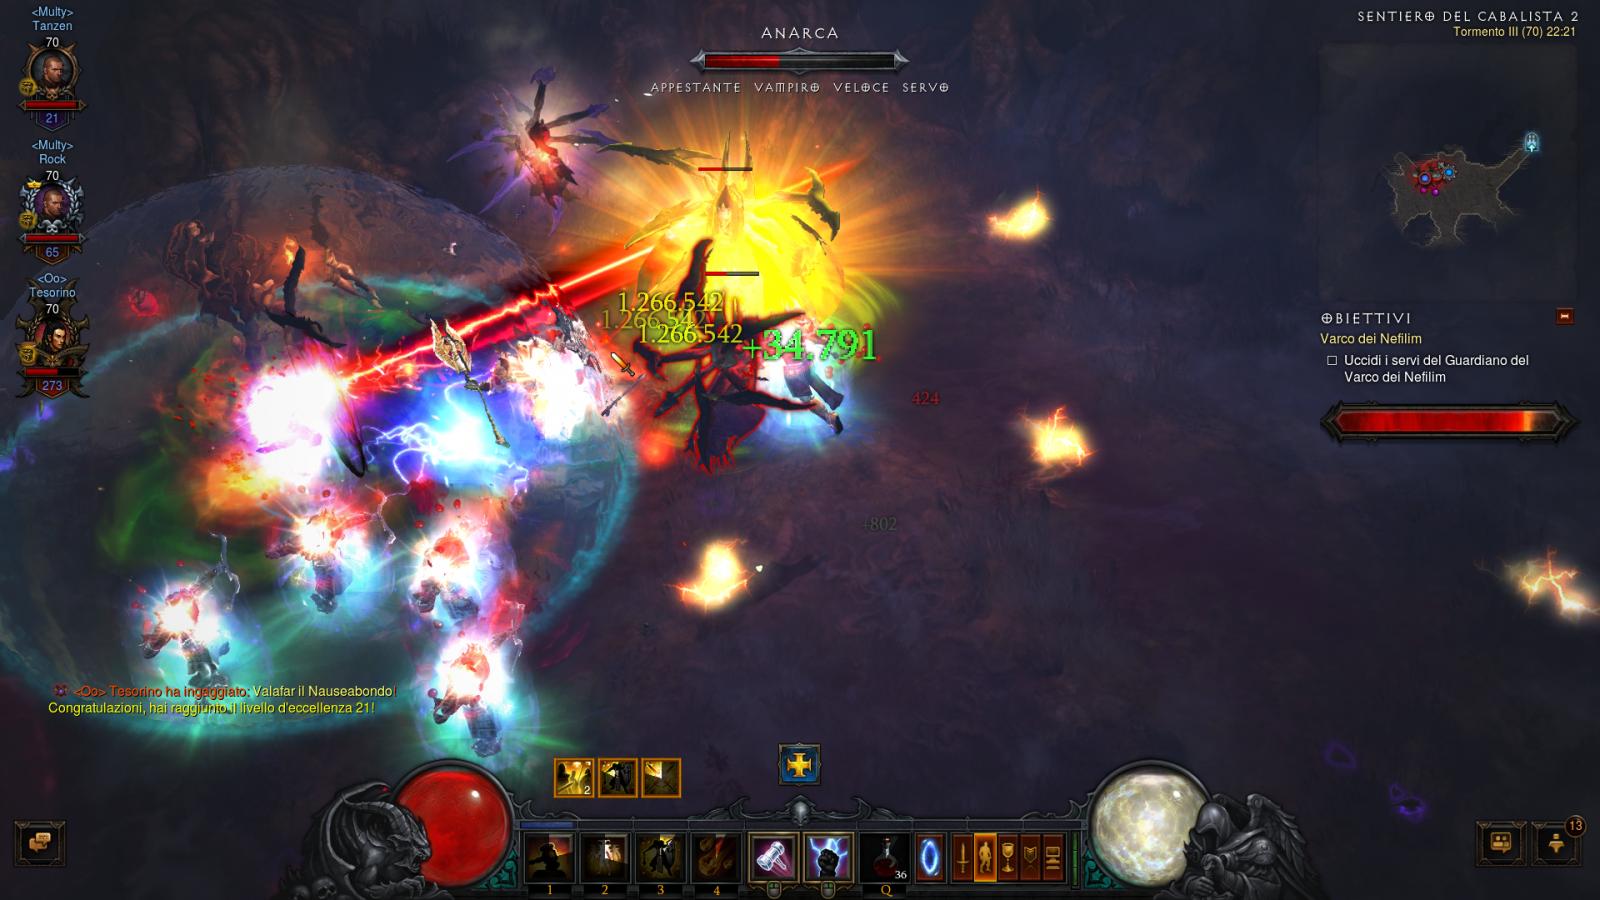 Diablo III 2014-04-13 22-21-43-46